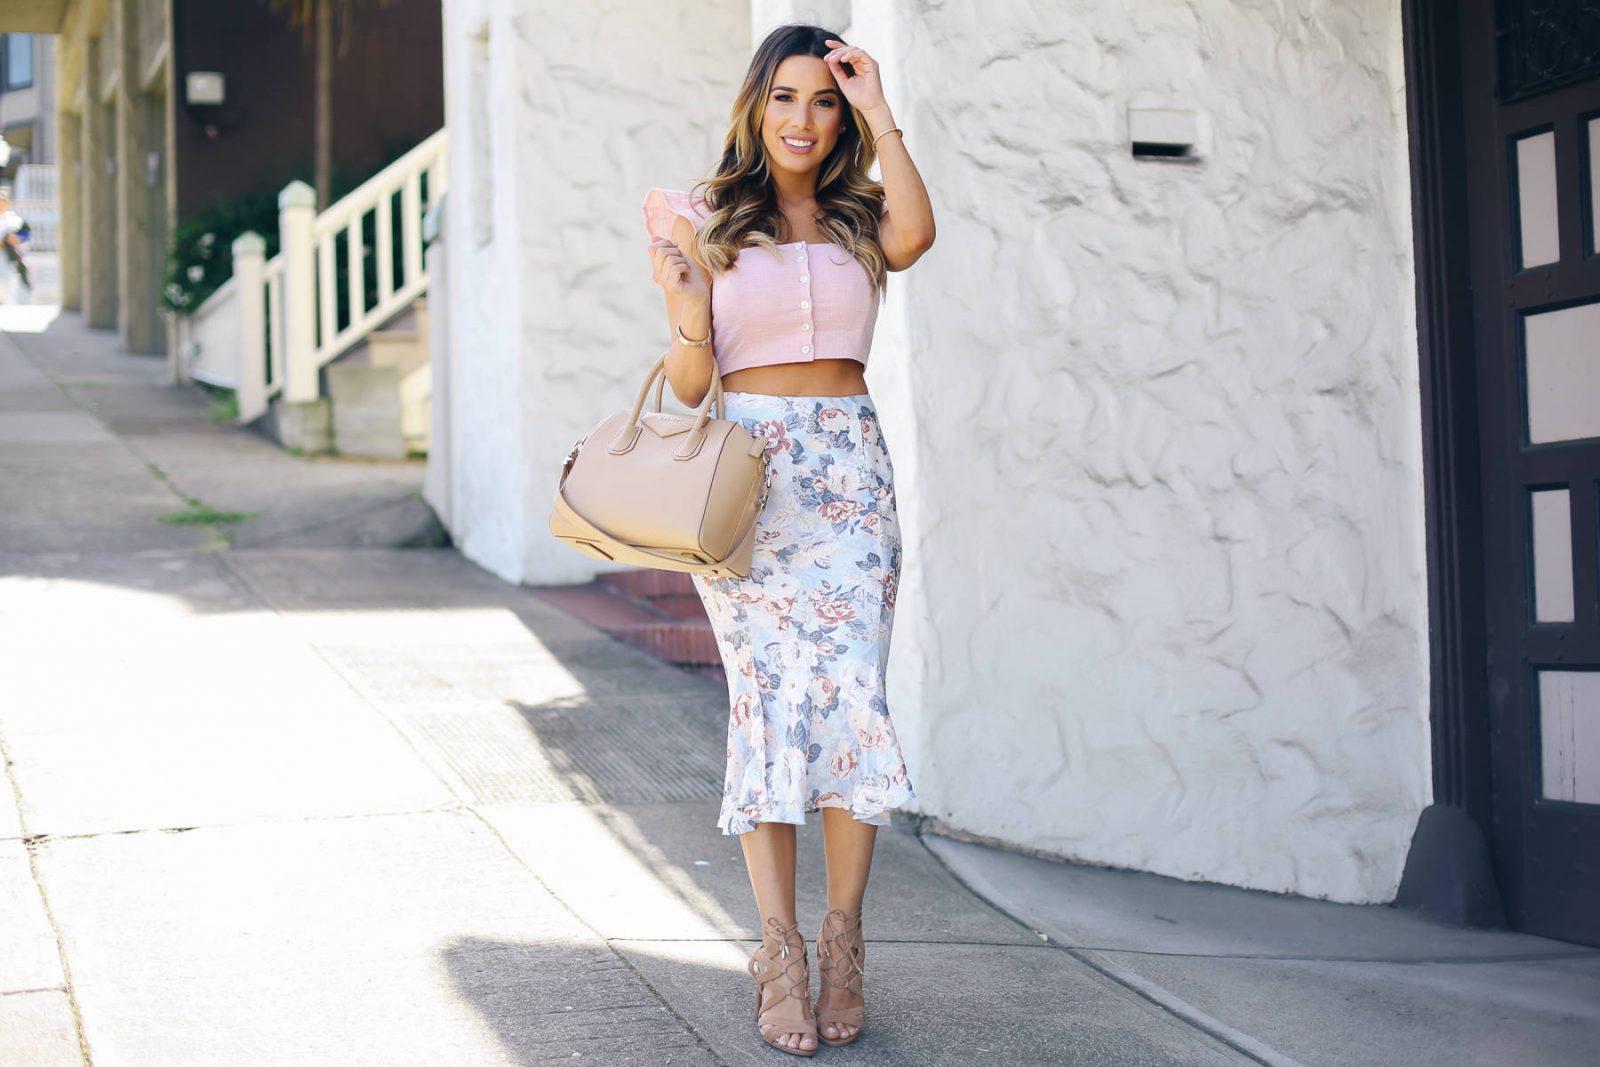 Ariana-Lauren-FashionBorn-Crop-Top-Topshelf-Style-Midi-Flared-Skirt-Spring-Look-RyanbyRyanChua-2955